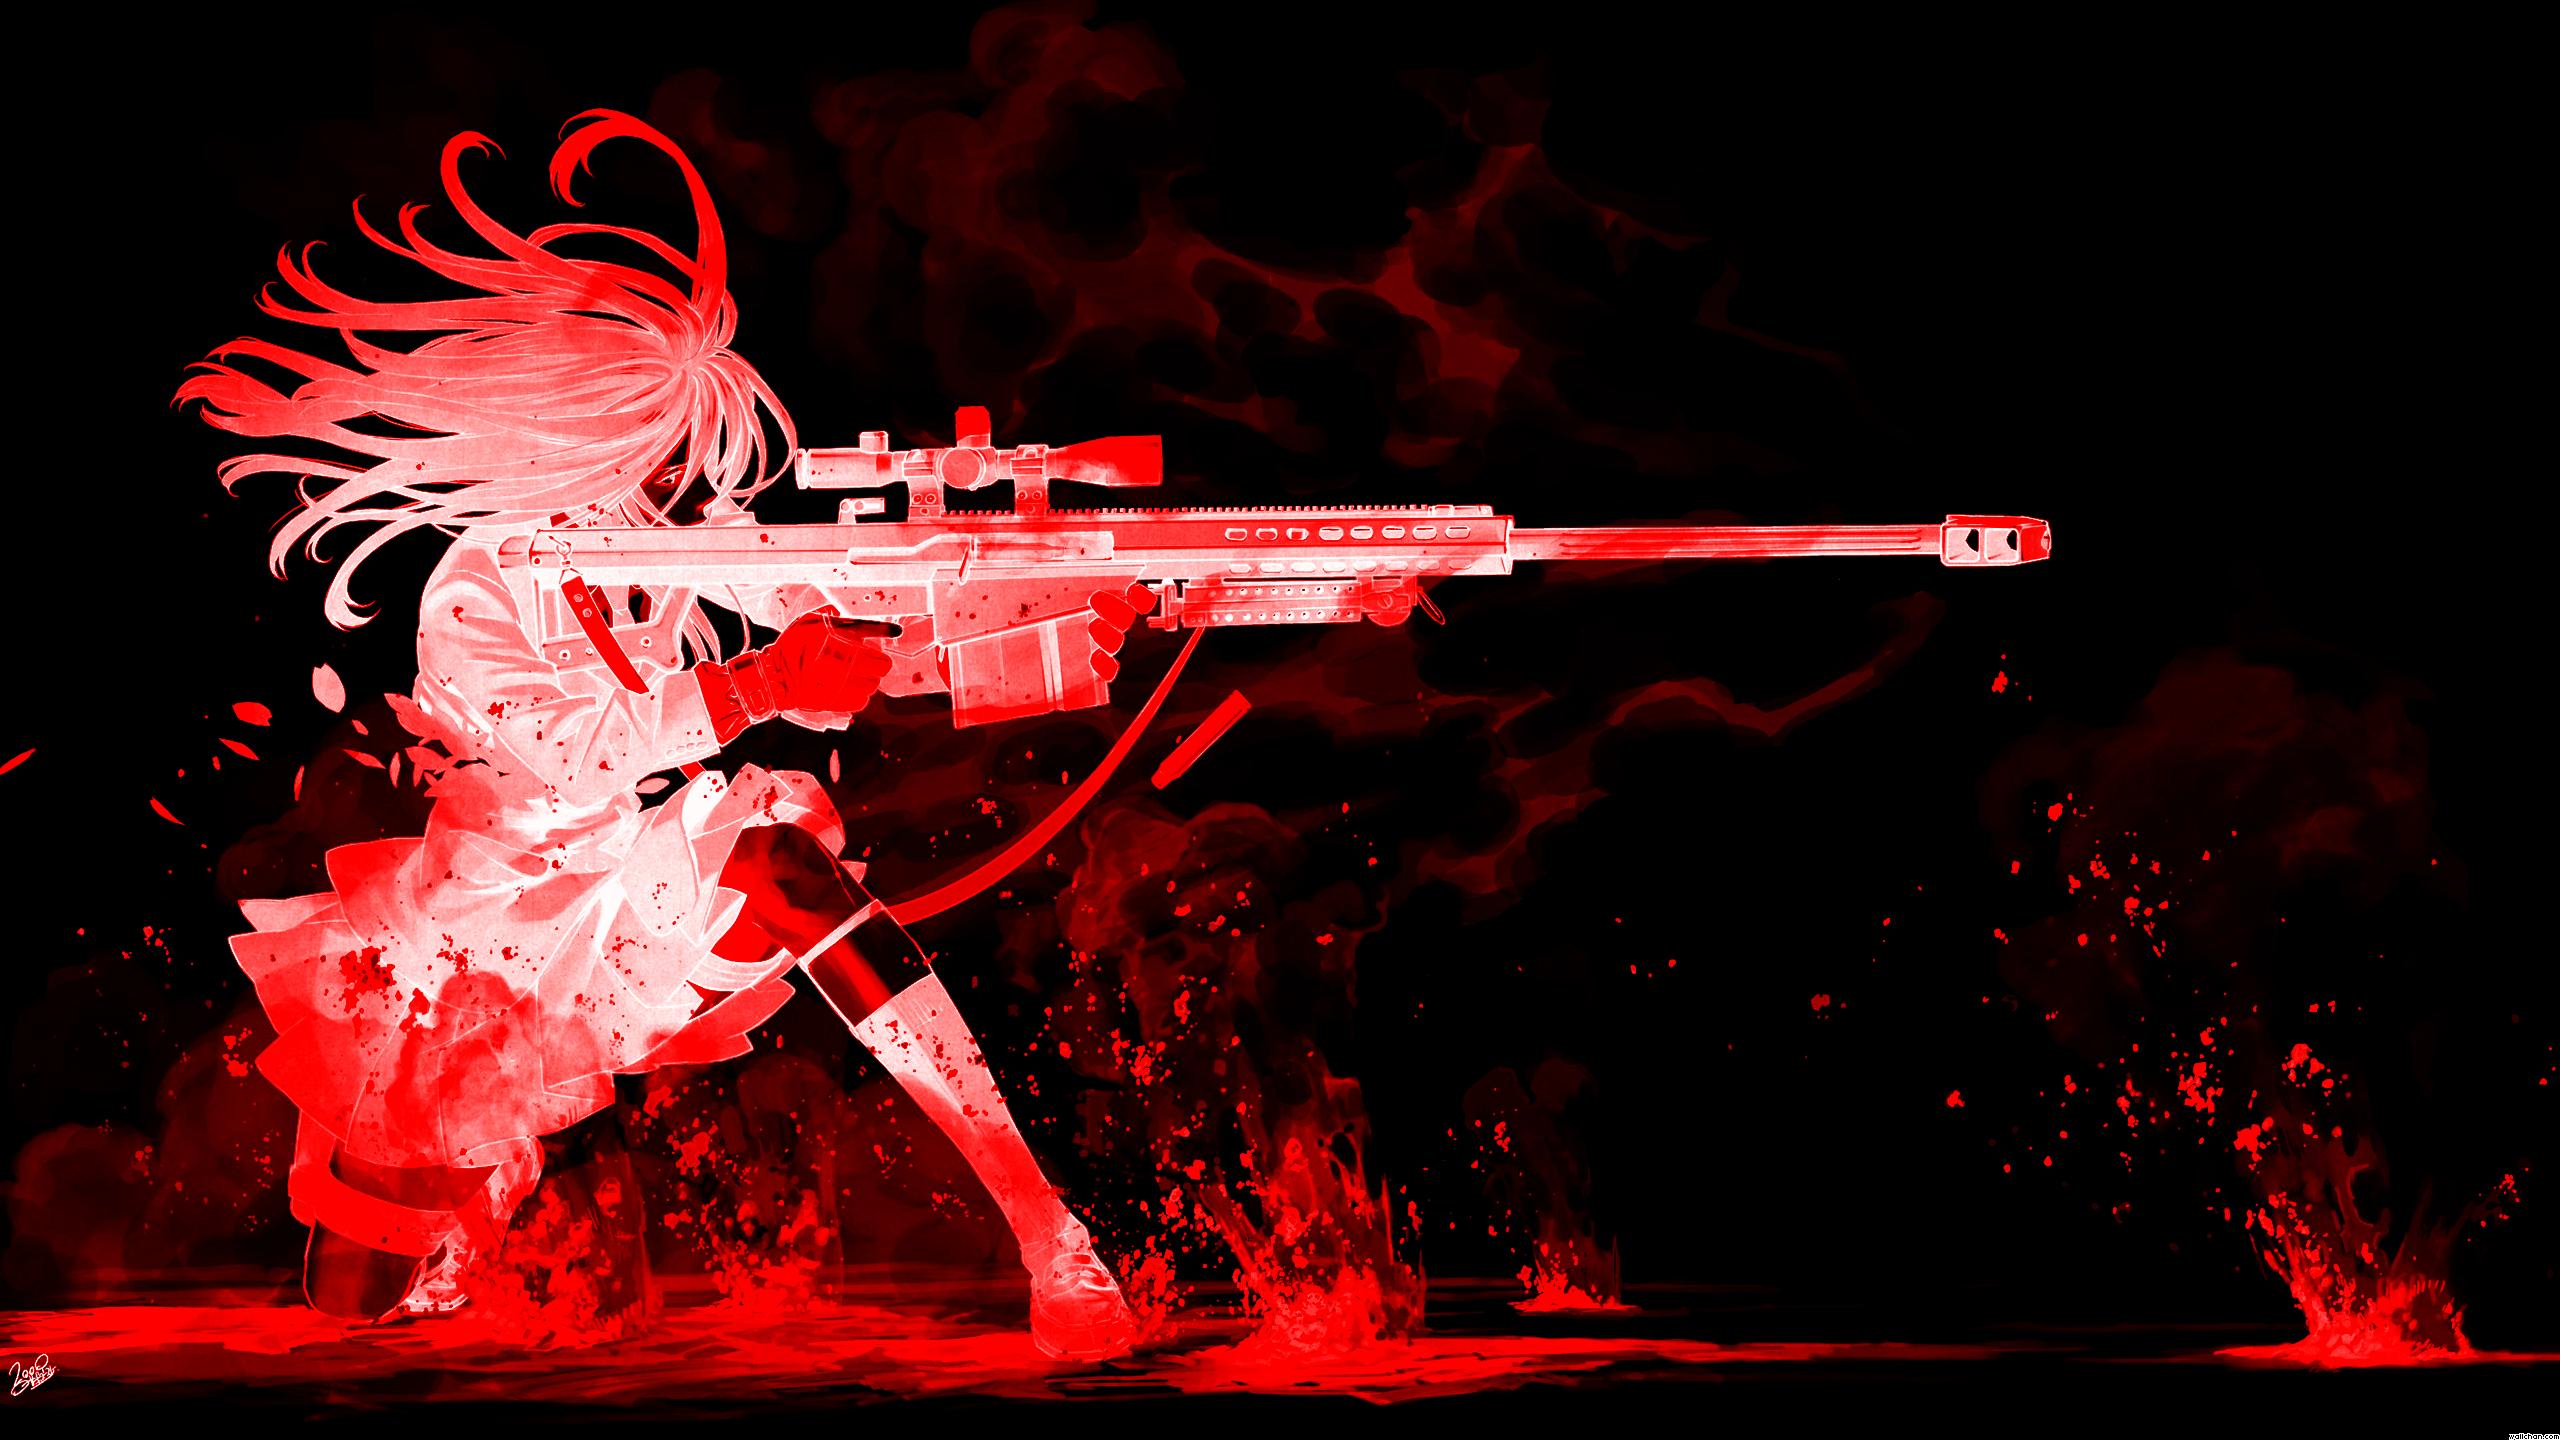 animewallpaper2560x144017.jpg (2560×1440)